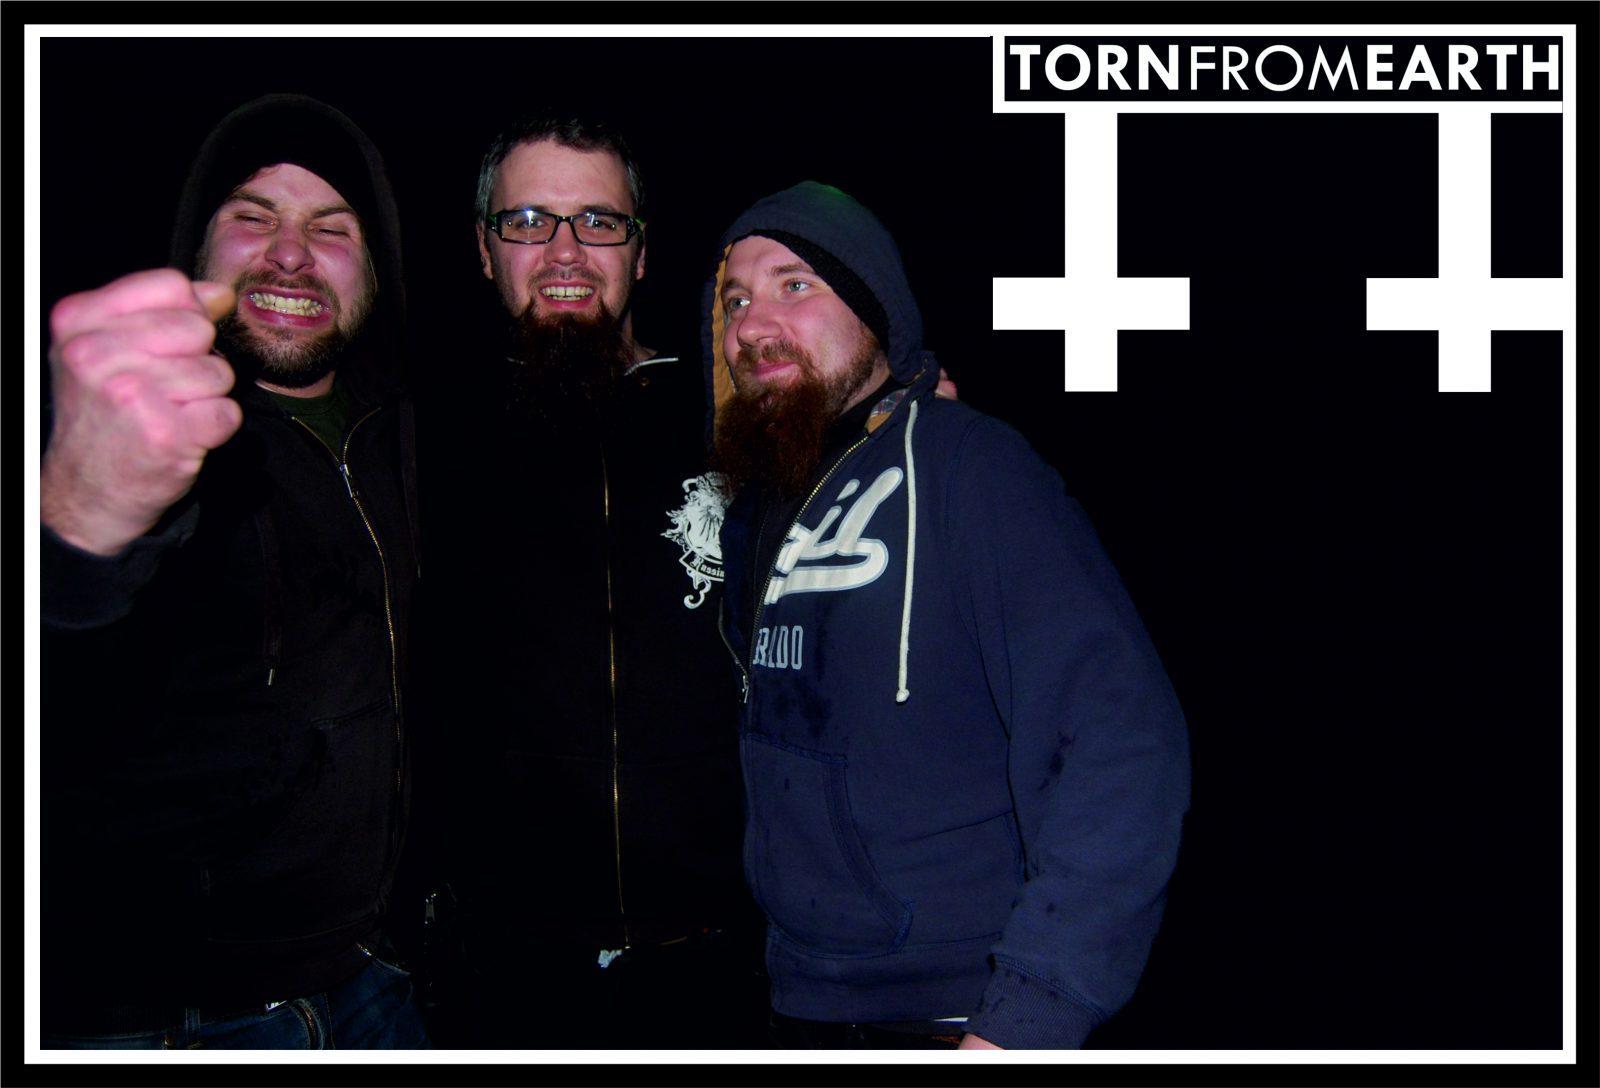 Torn From Earth 2013 II